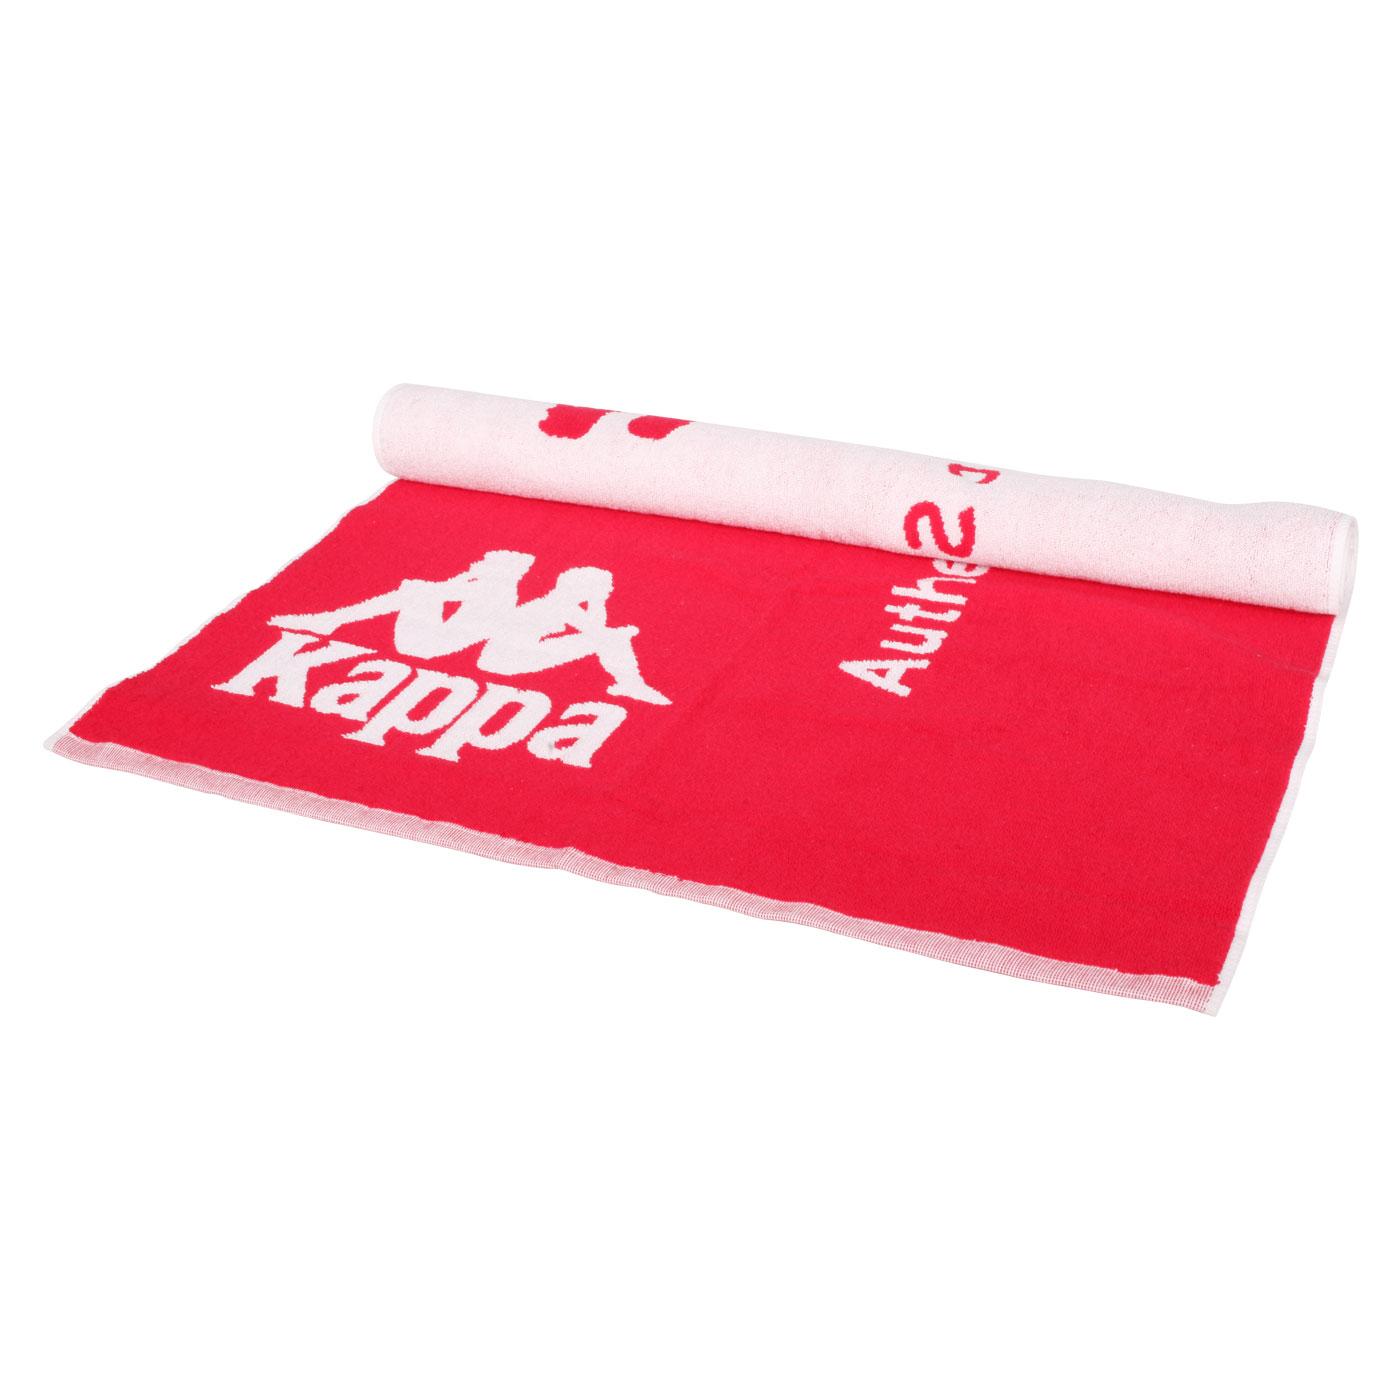 KAPPA 運動毛巾 32157QW-D18 - 紅白